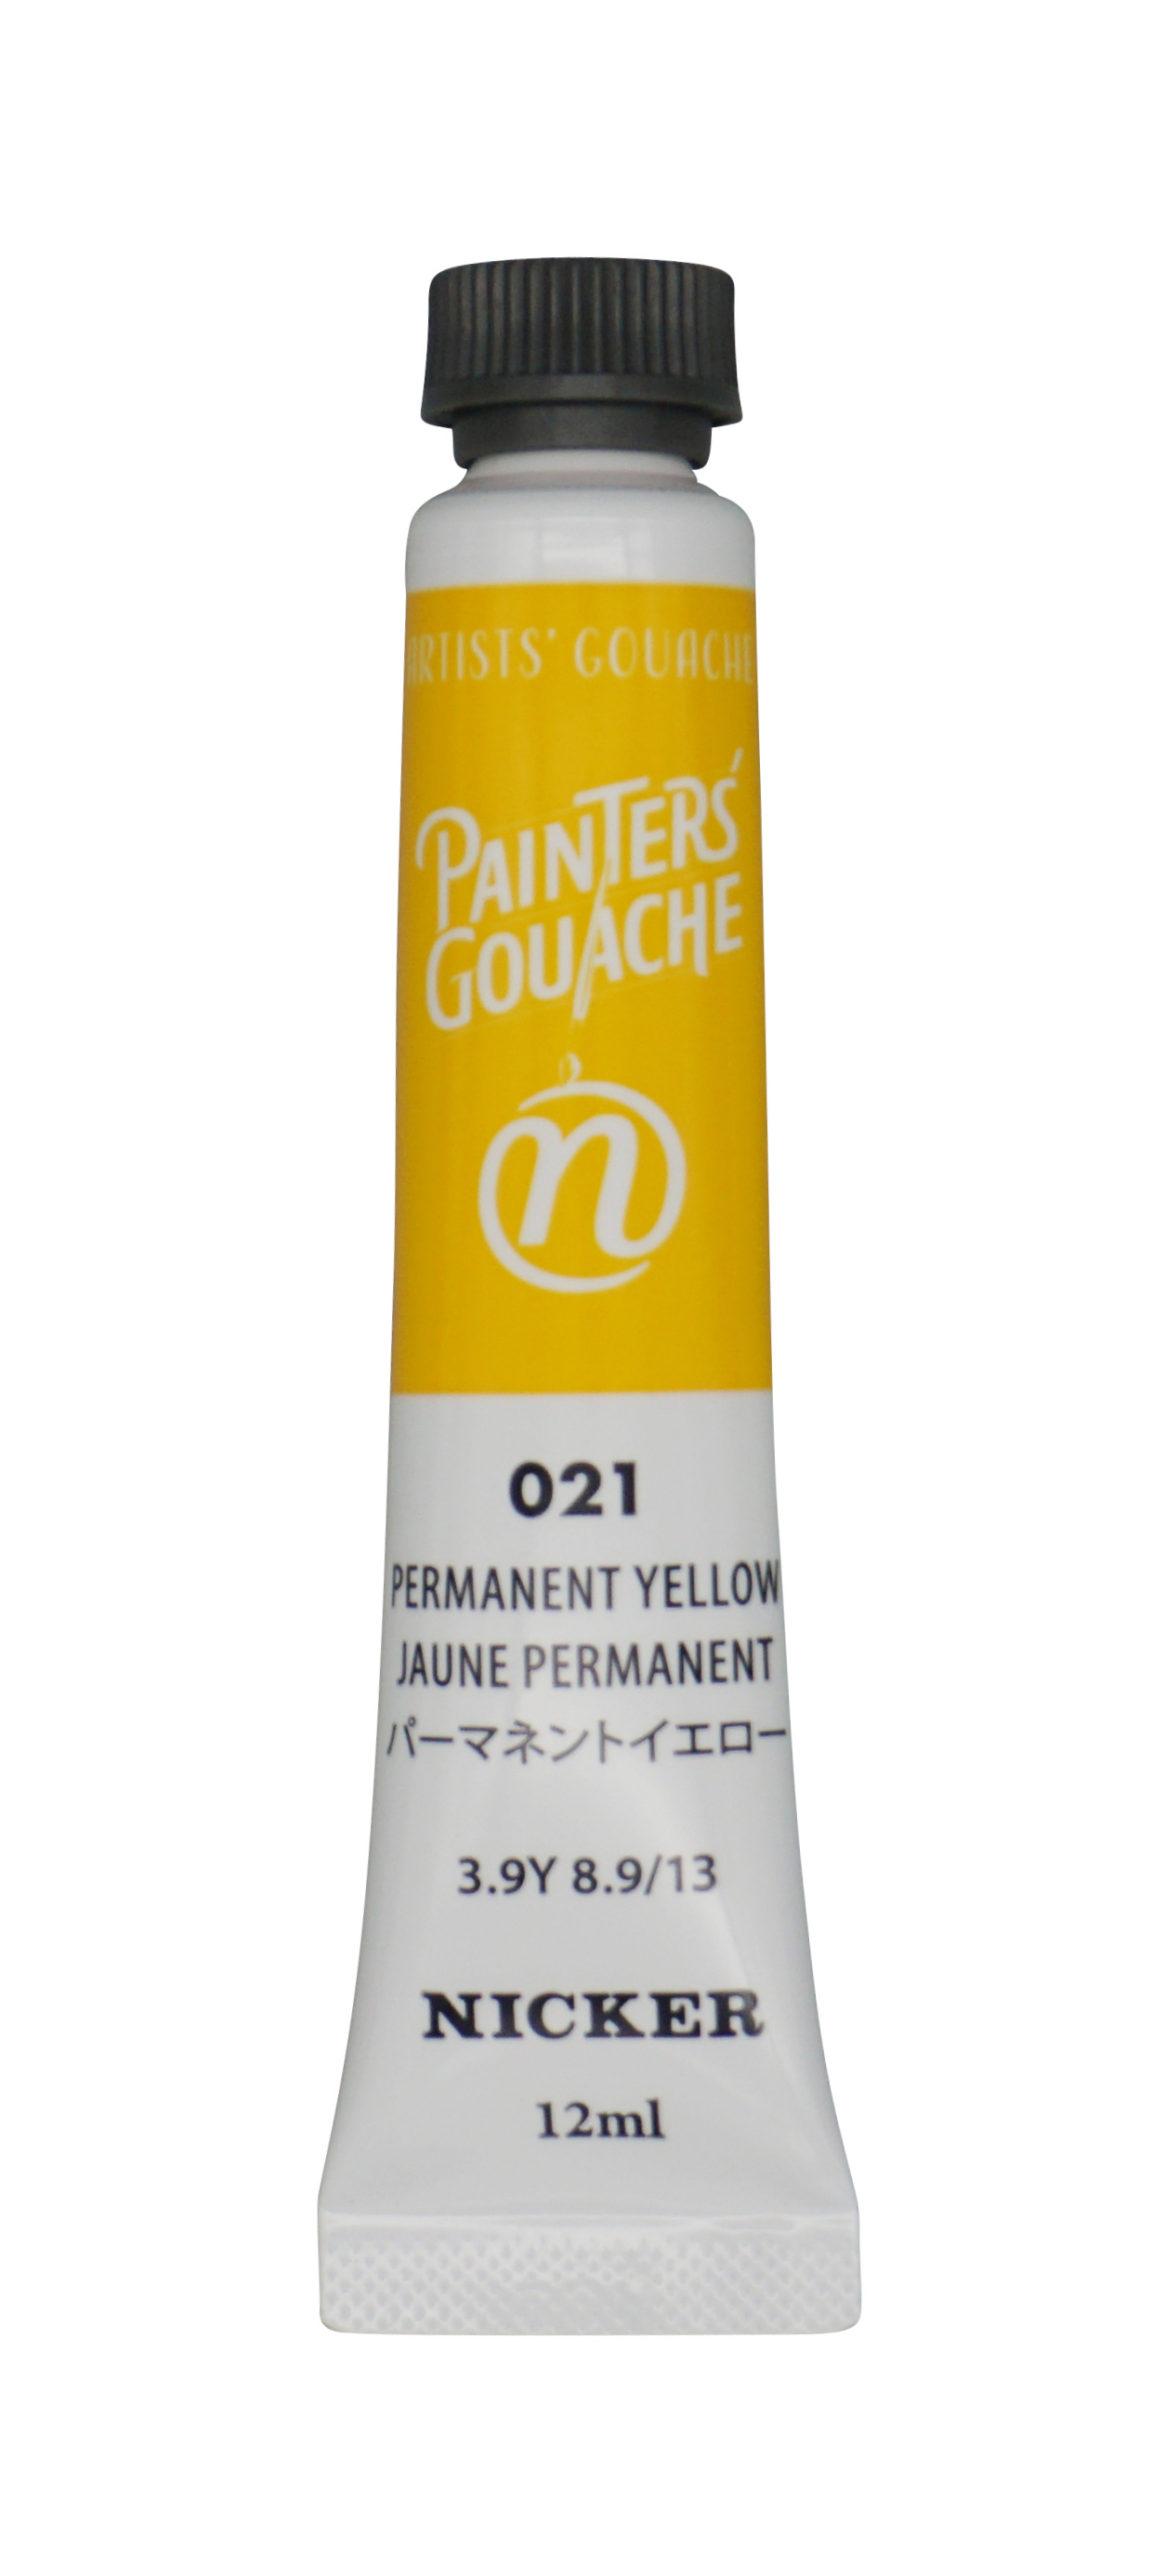 PAINTER'S GOUACHE PERMANENT YELLOW